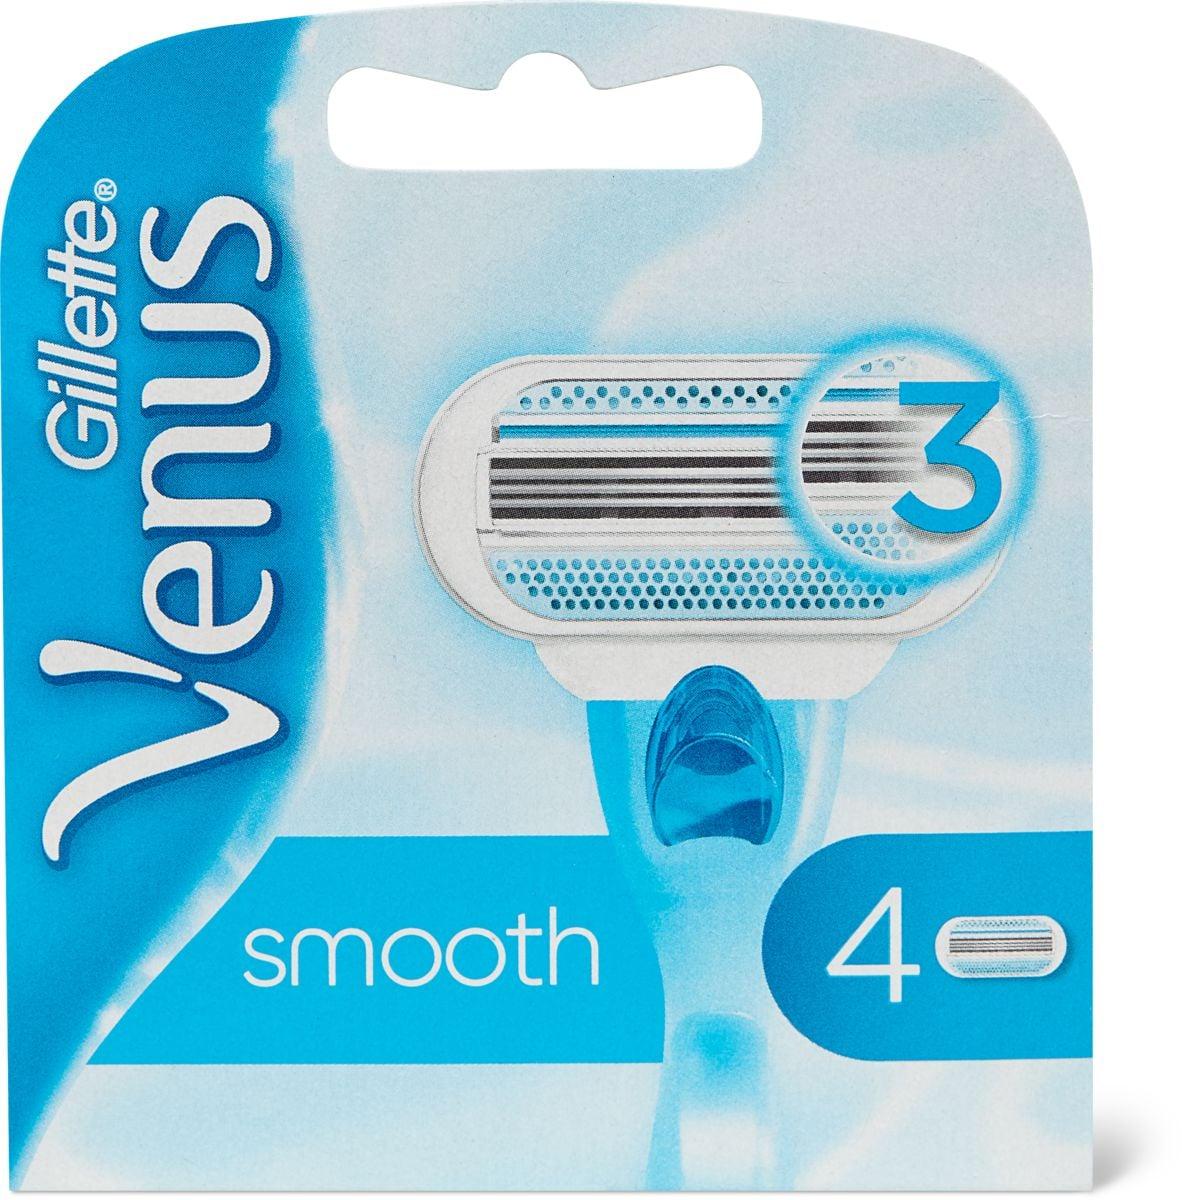 Gillette Venus Smooth Klingen